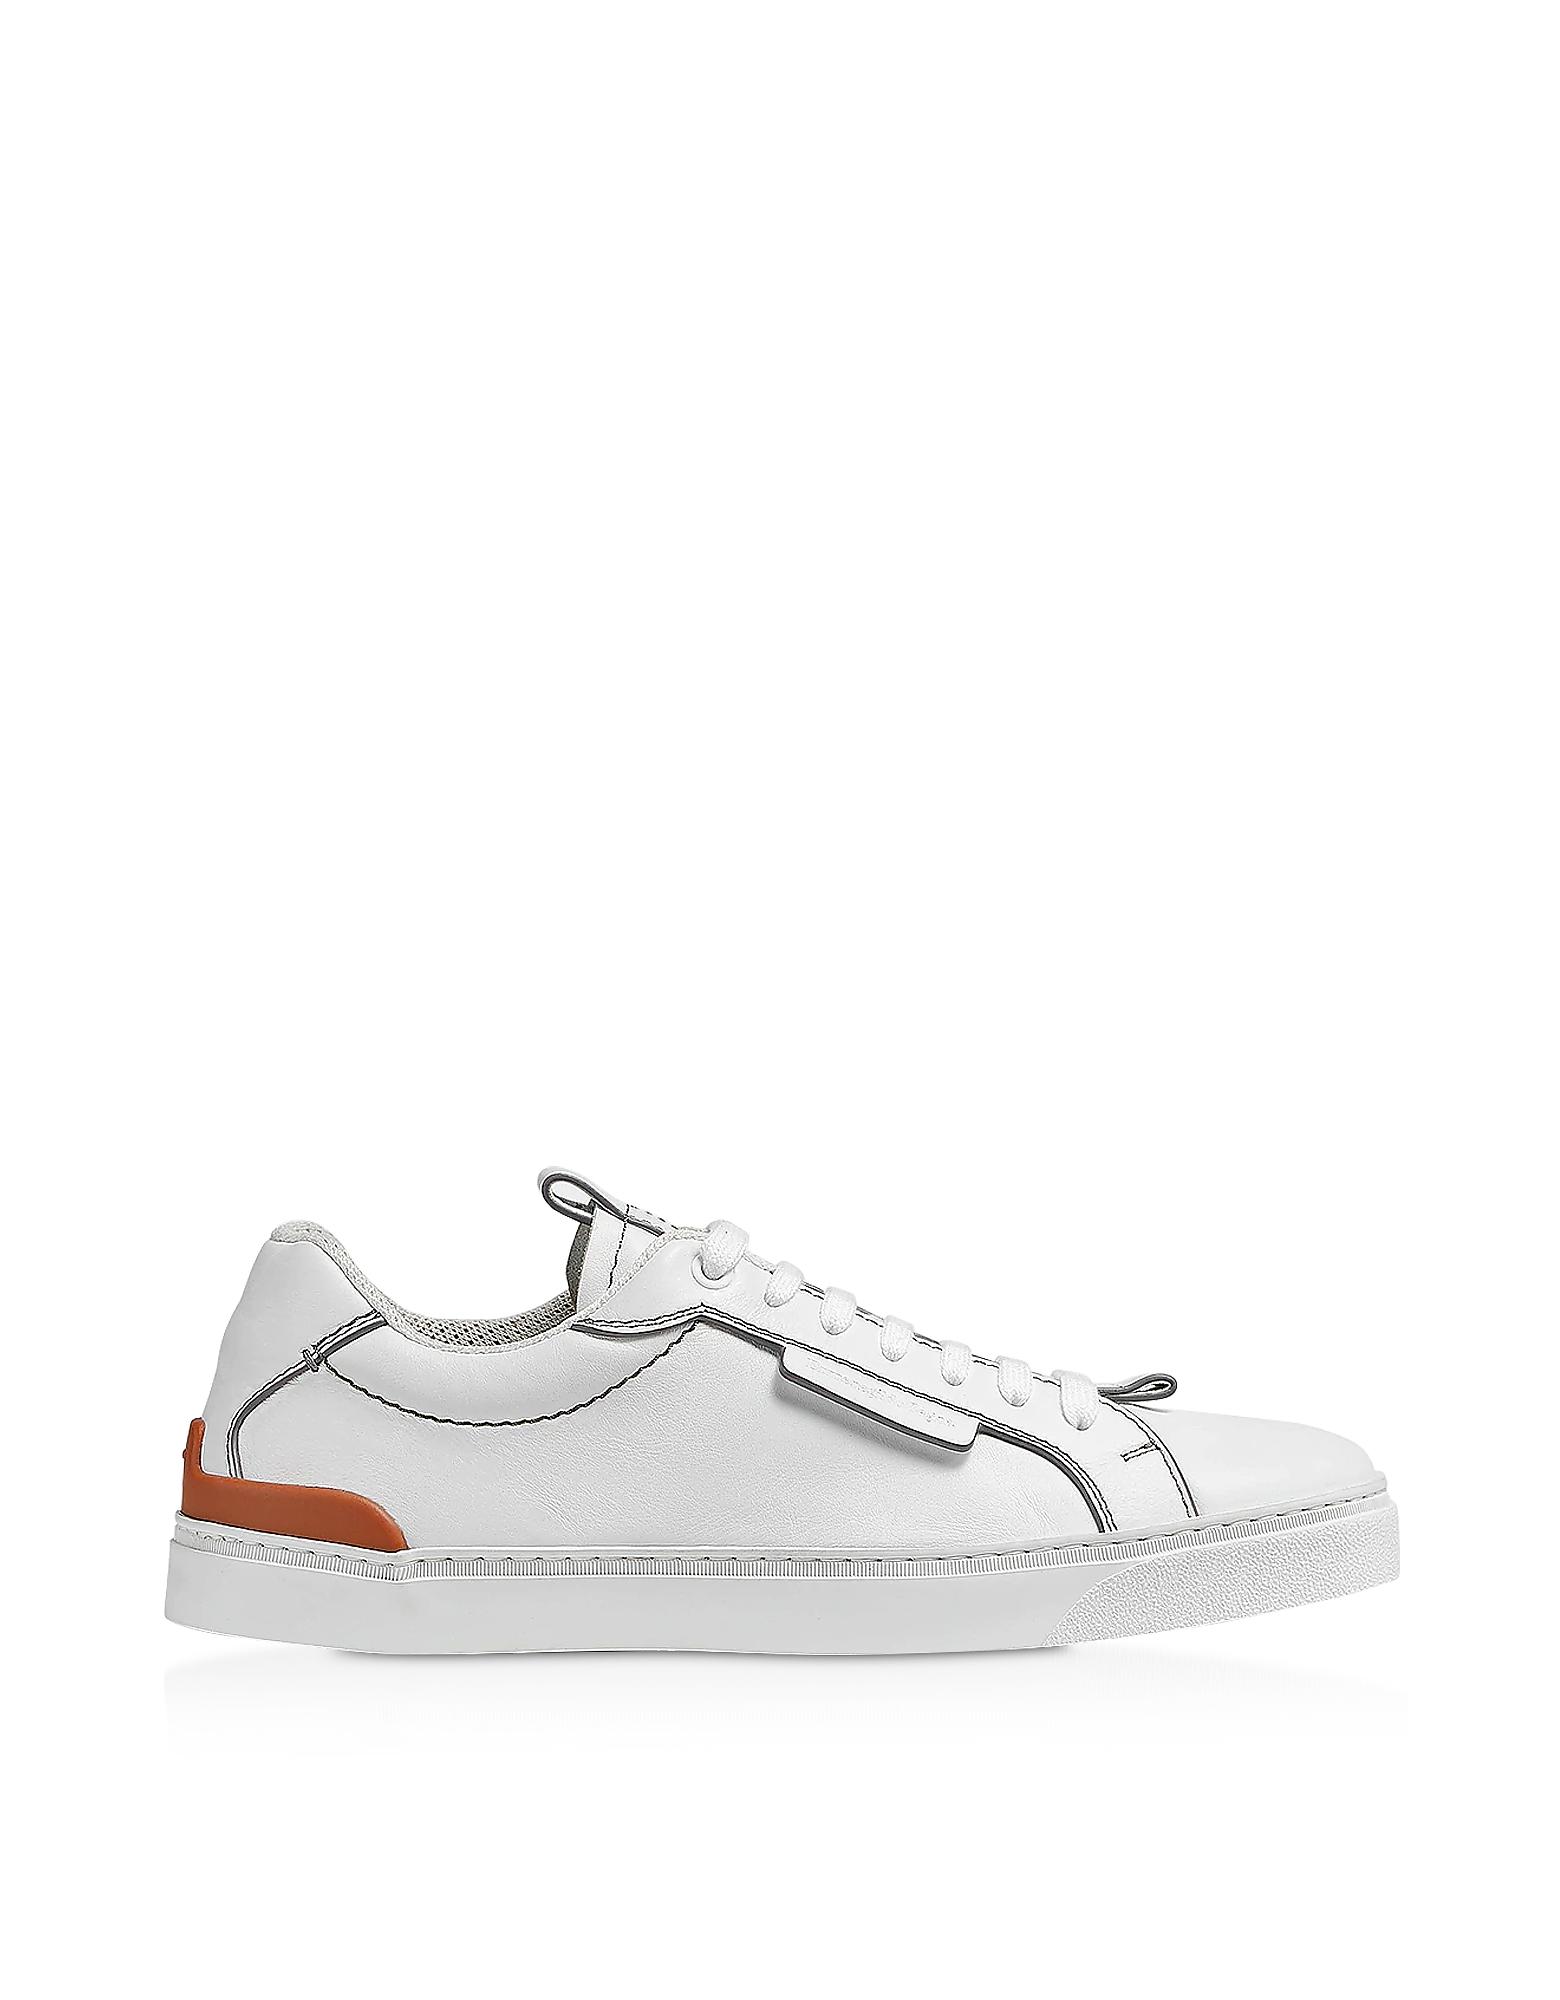 Ermenegildo Zegna Sneakers WHITE EZ LUX LEATHER MEN'S SNEAKERS